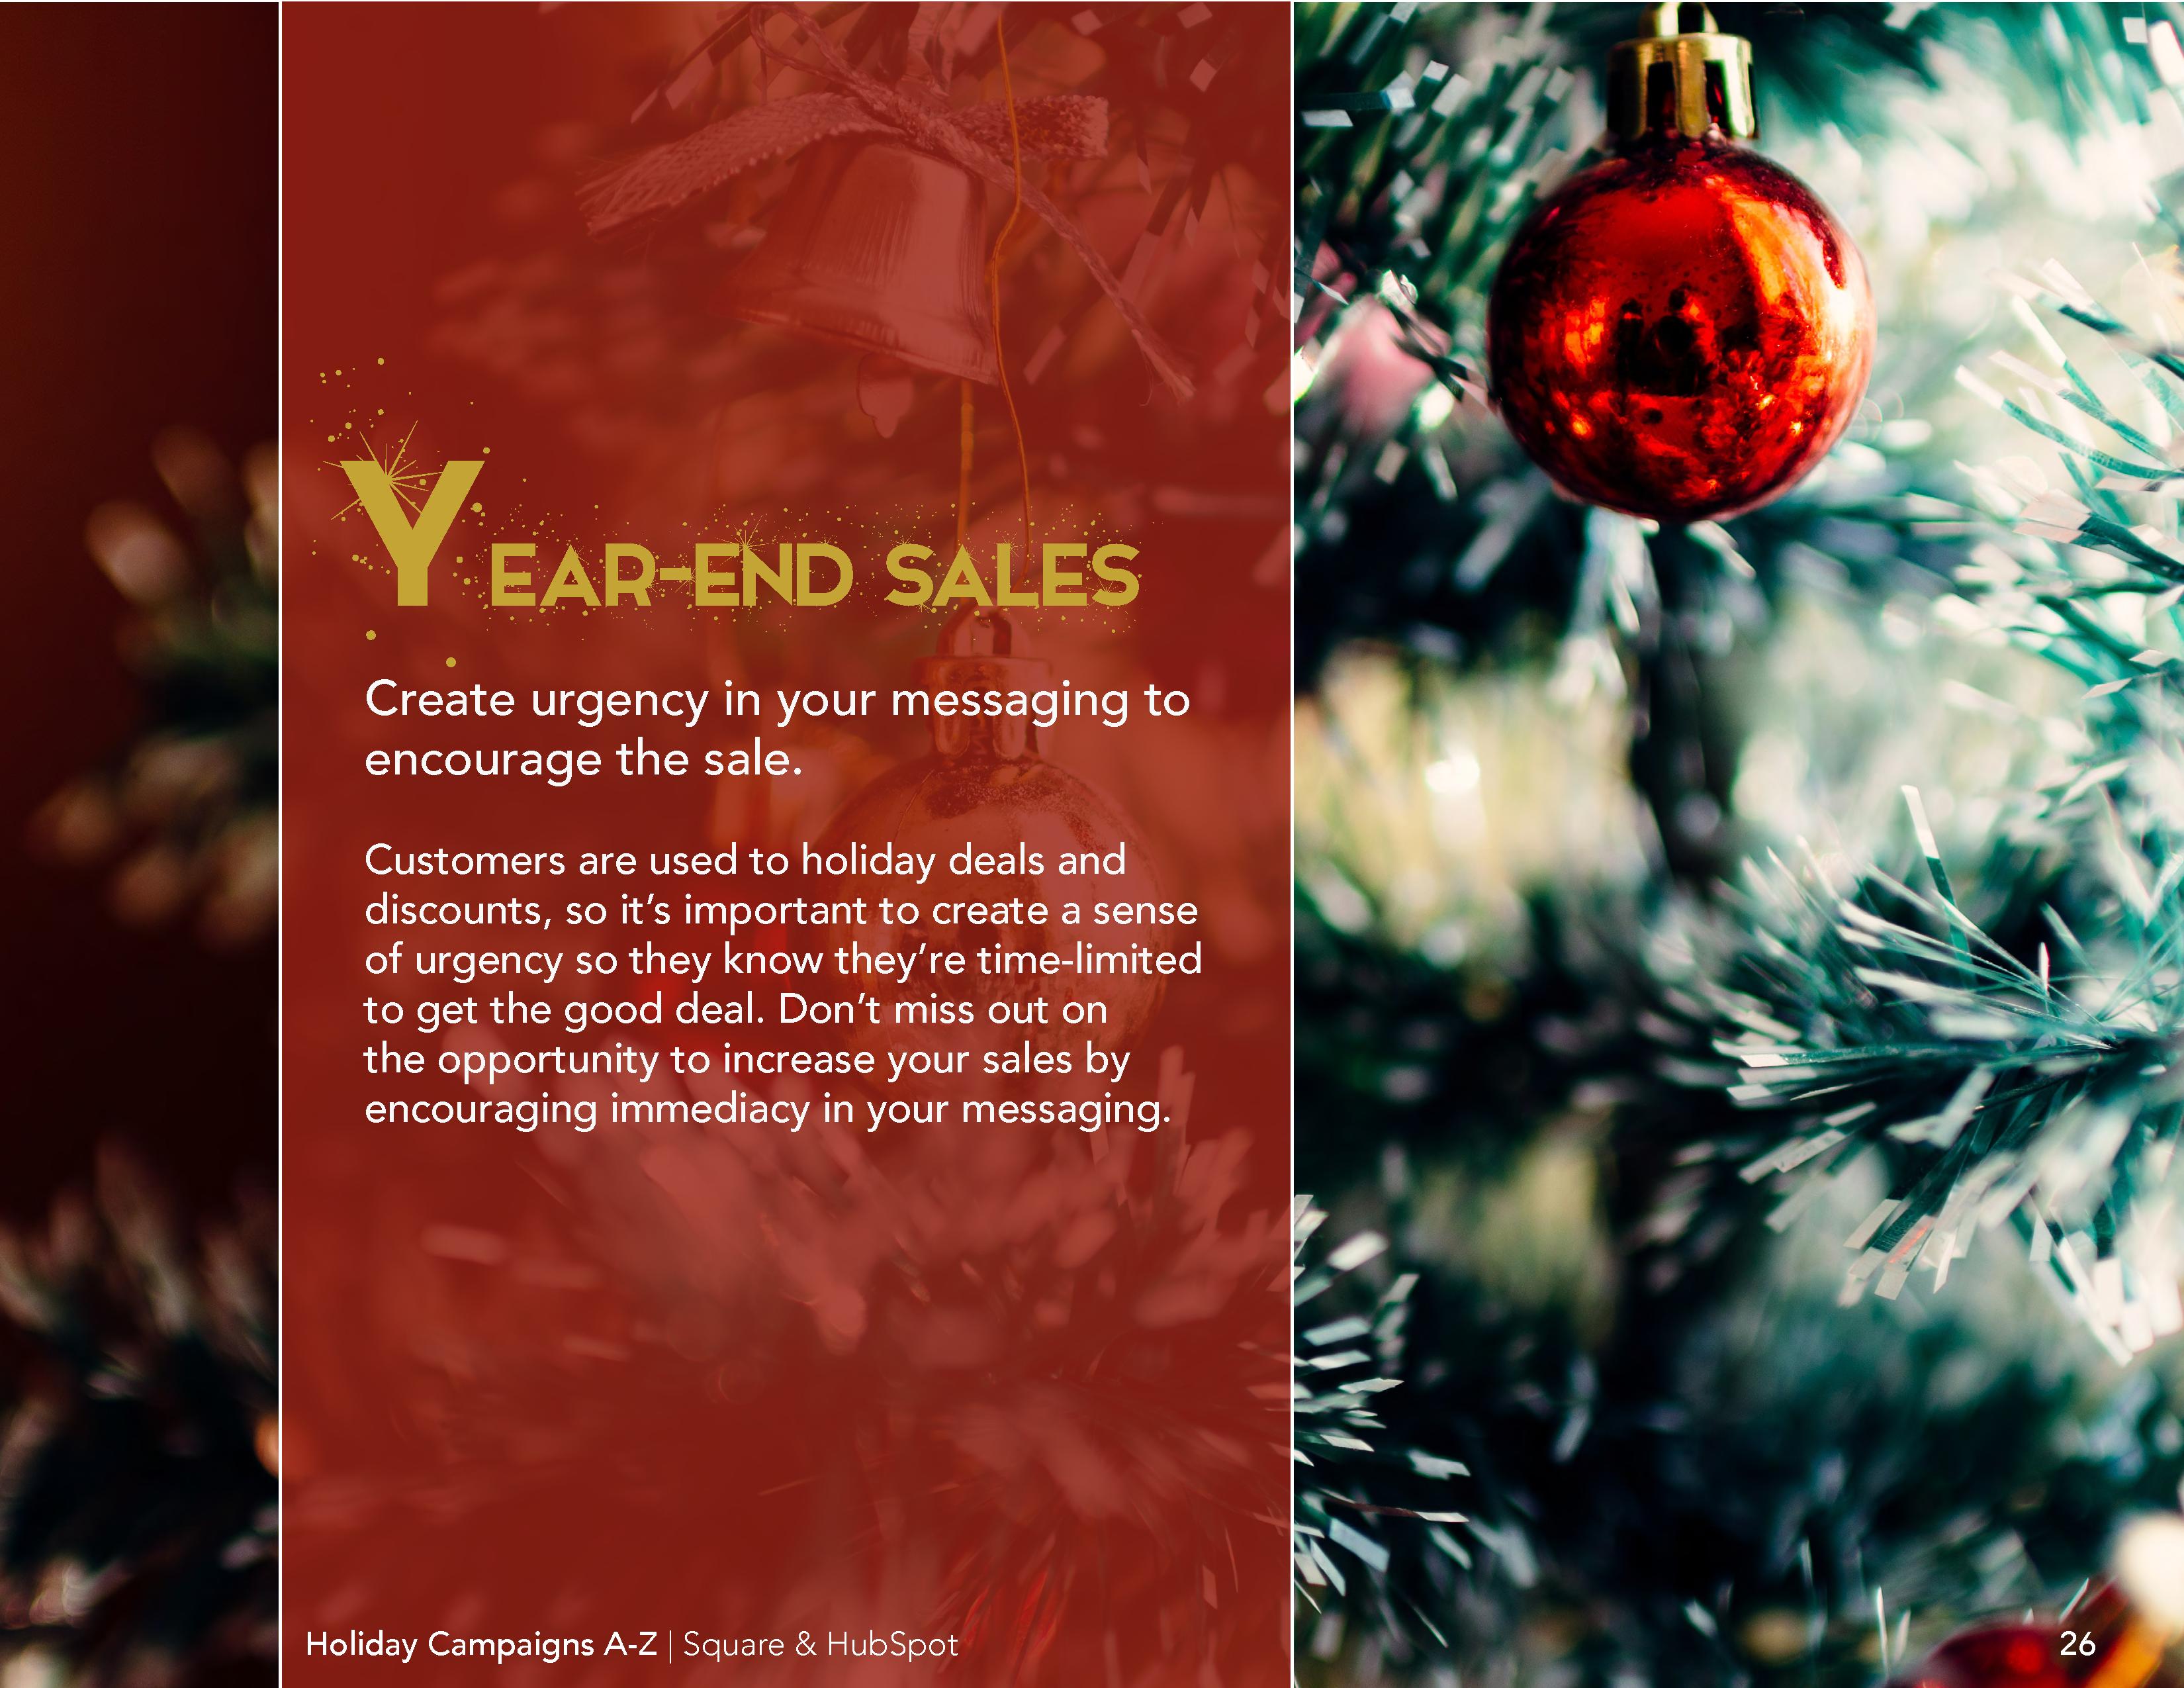 Holiday Marketing Campaign Ideas A-Z